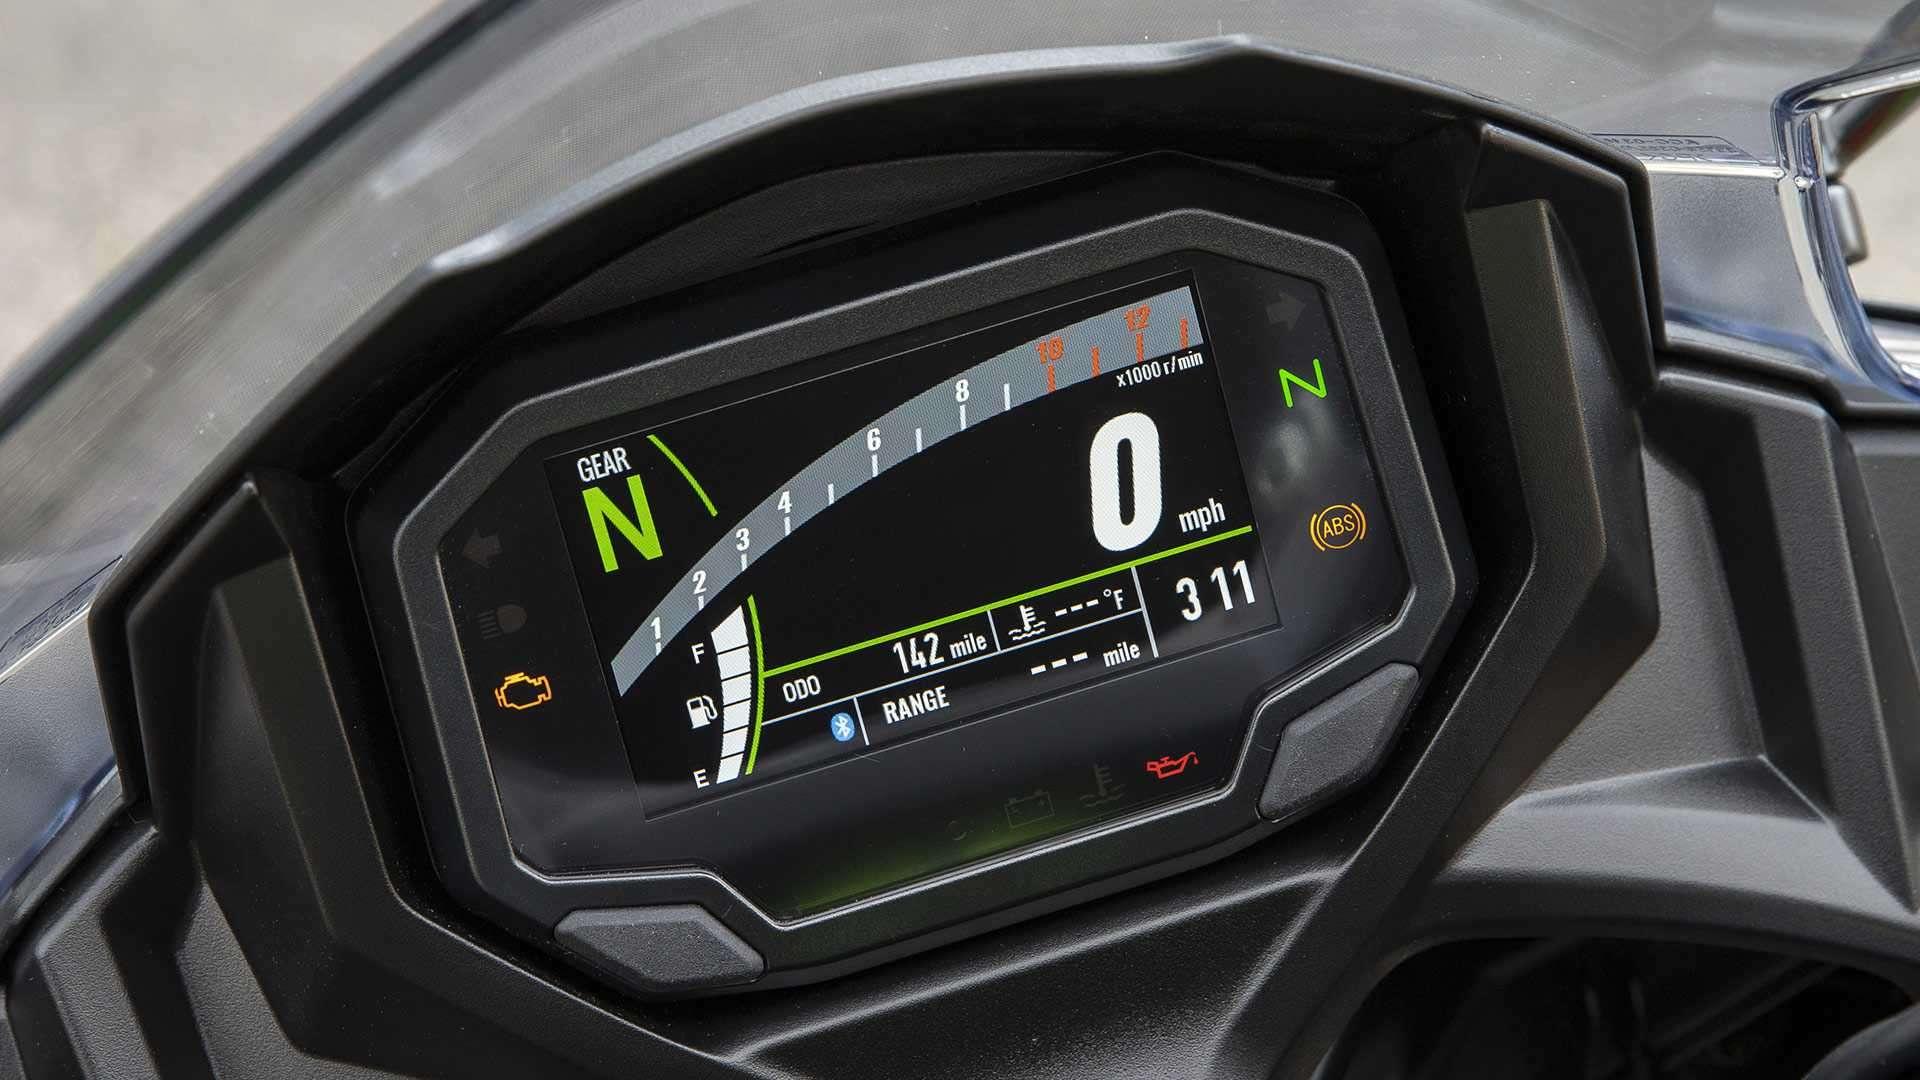 TFT Dash Kawasaki Ninja 650 ABS KRT Edition 2020